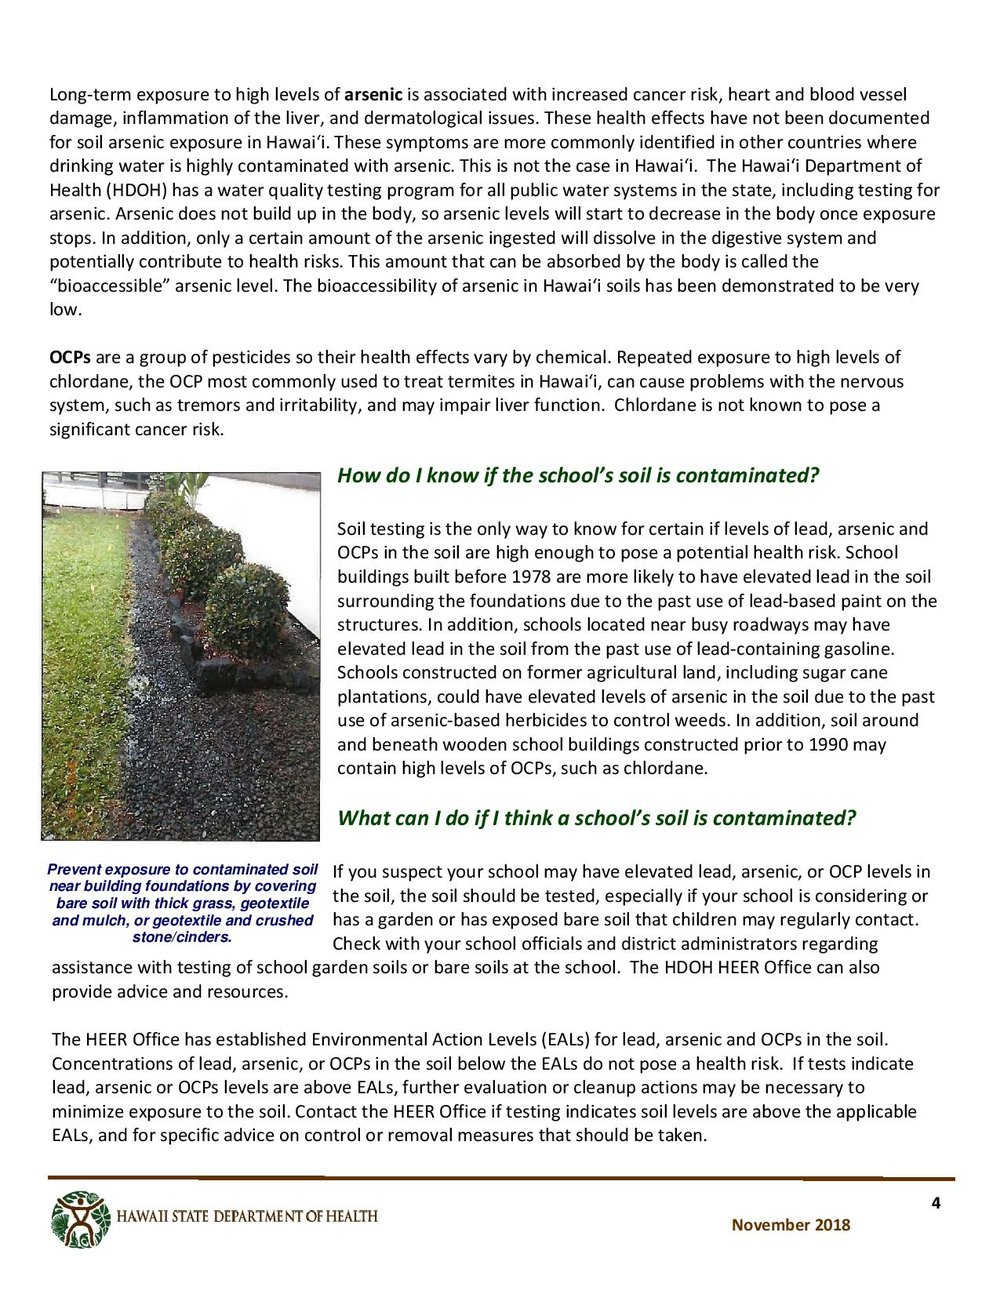 Contaminated Soils Schools Fact Sheet-page-004.jpg